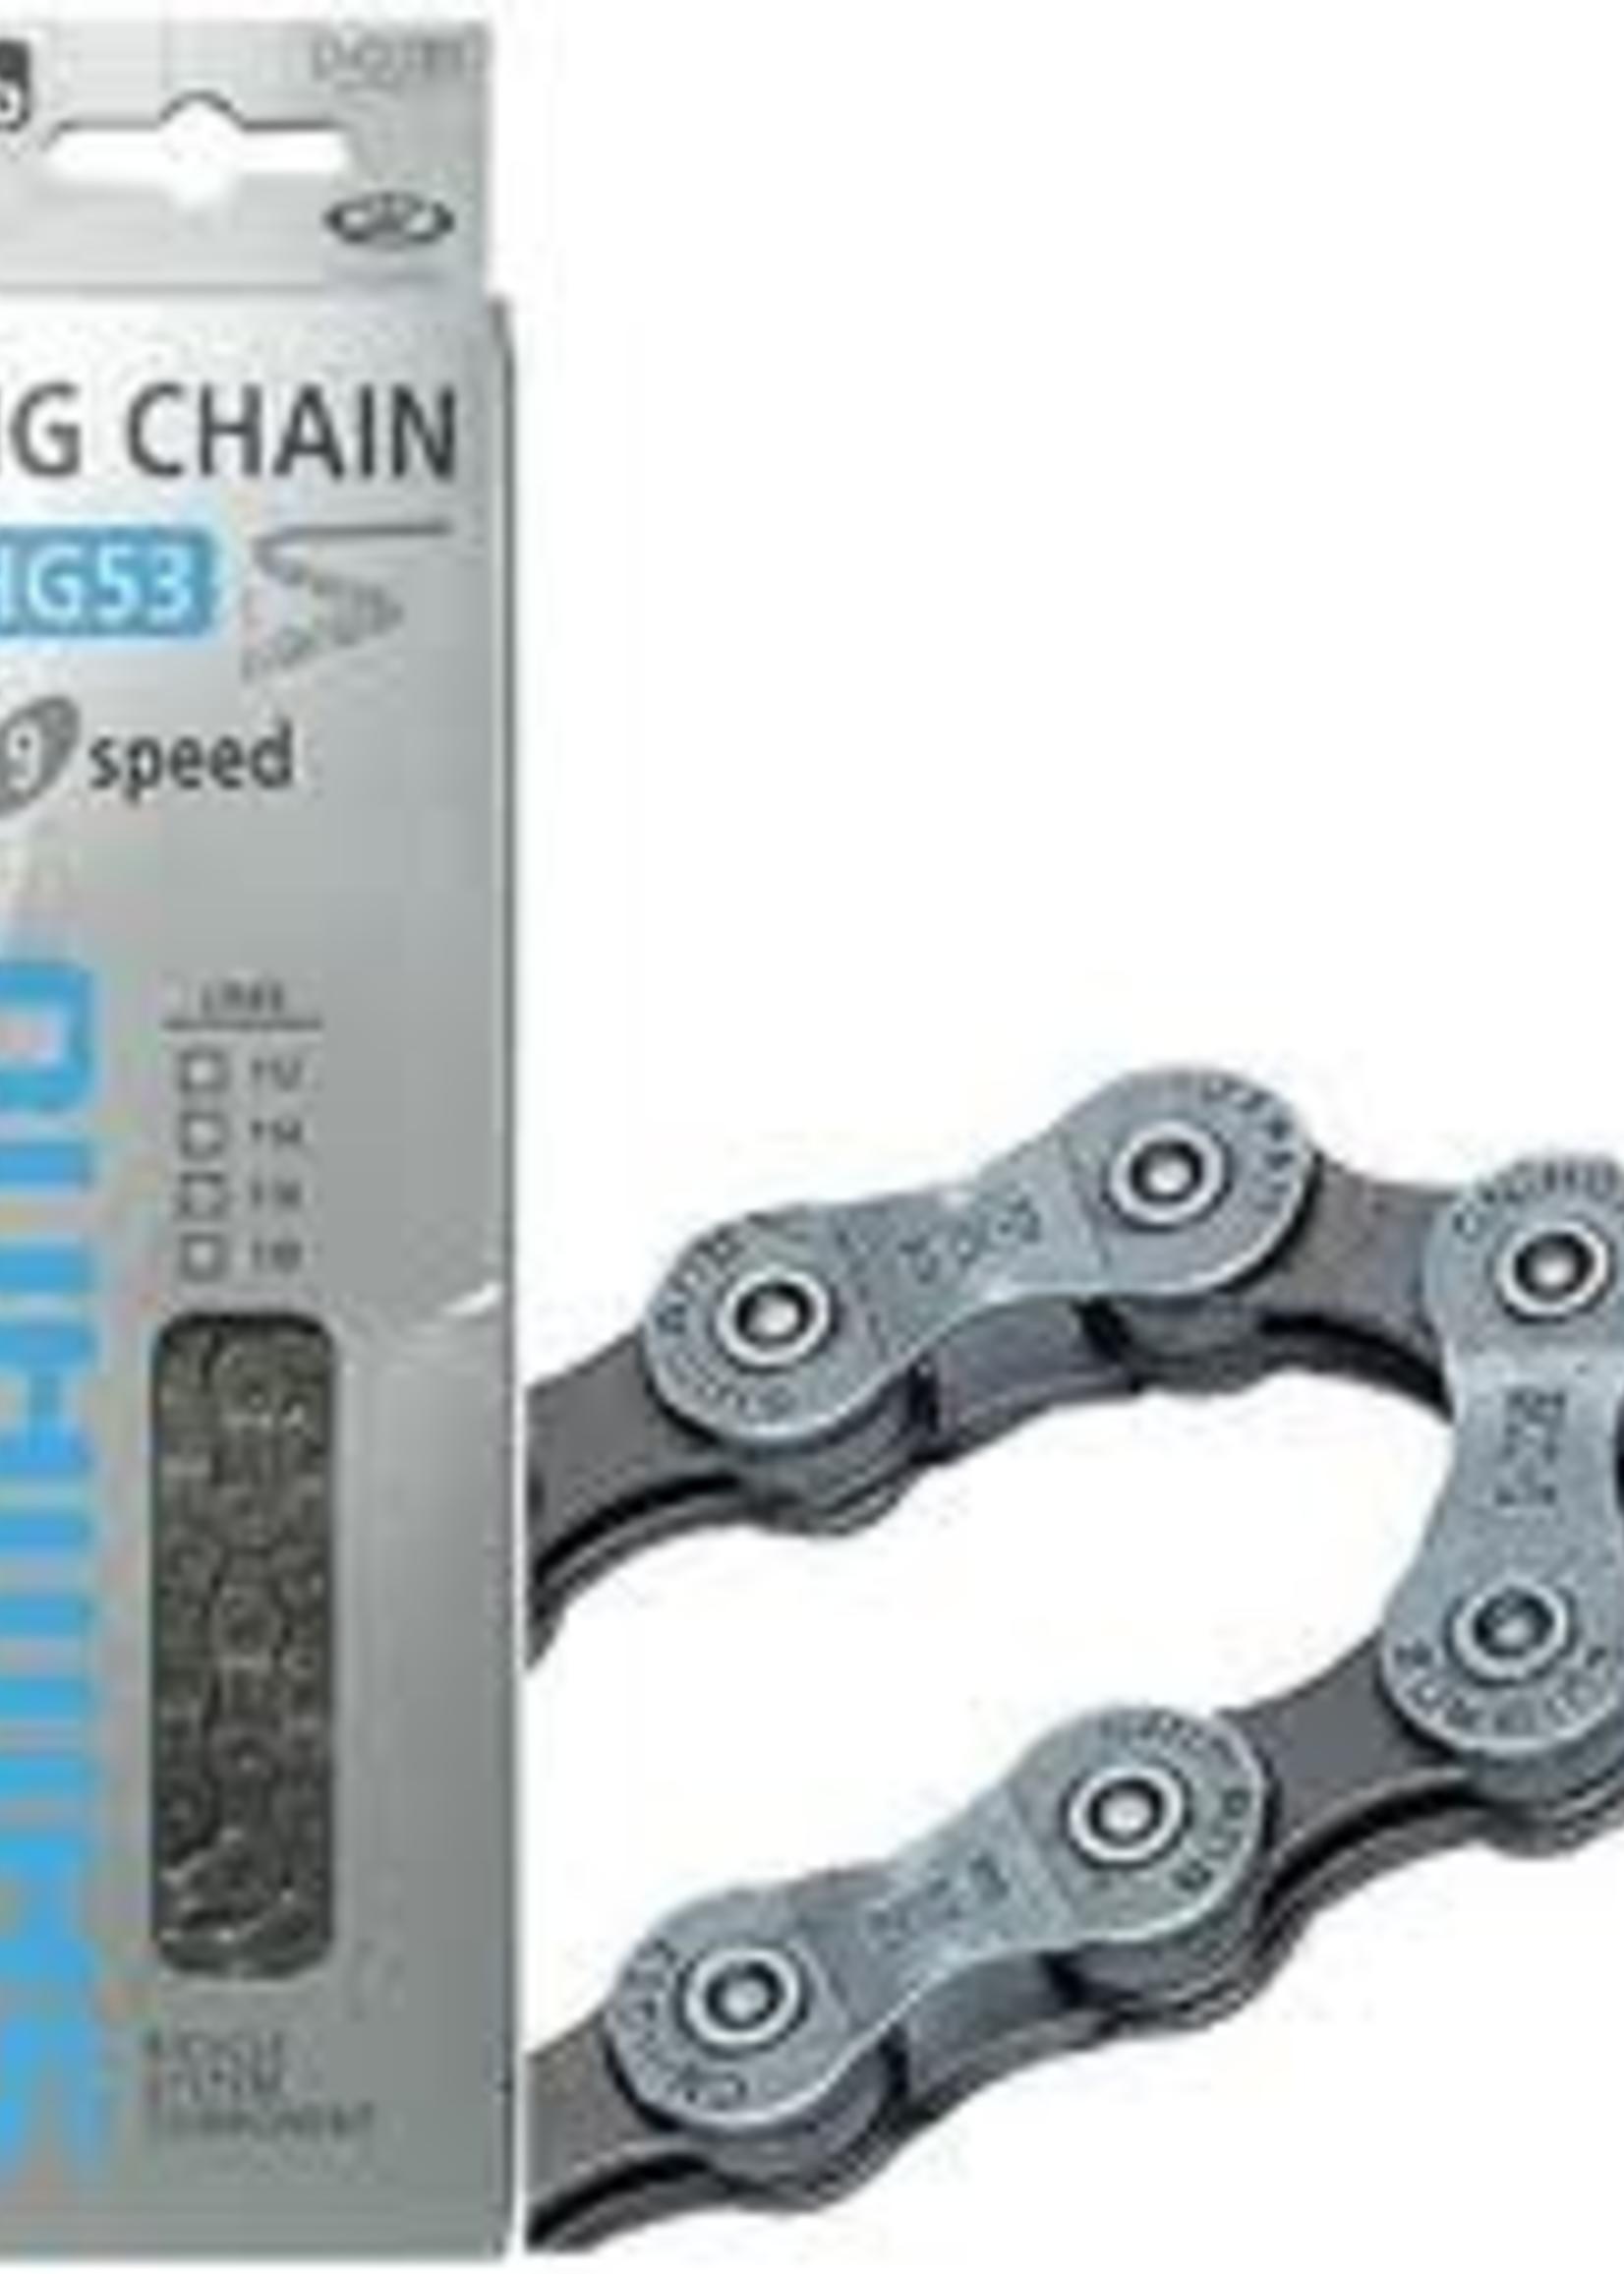 Shimano Shimano Chain CN-HG93 9 SPEED CHAIN